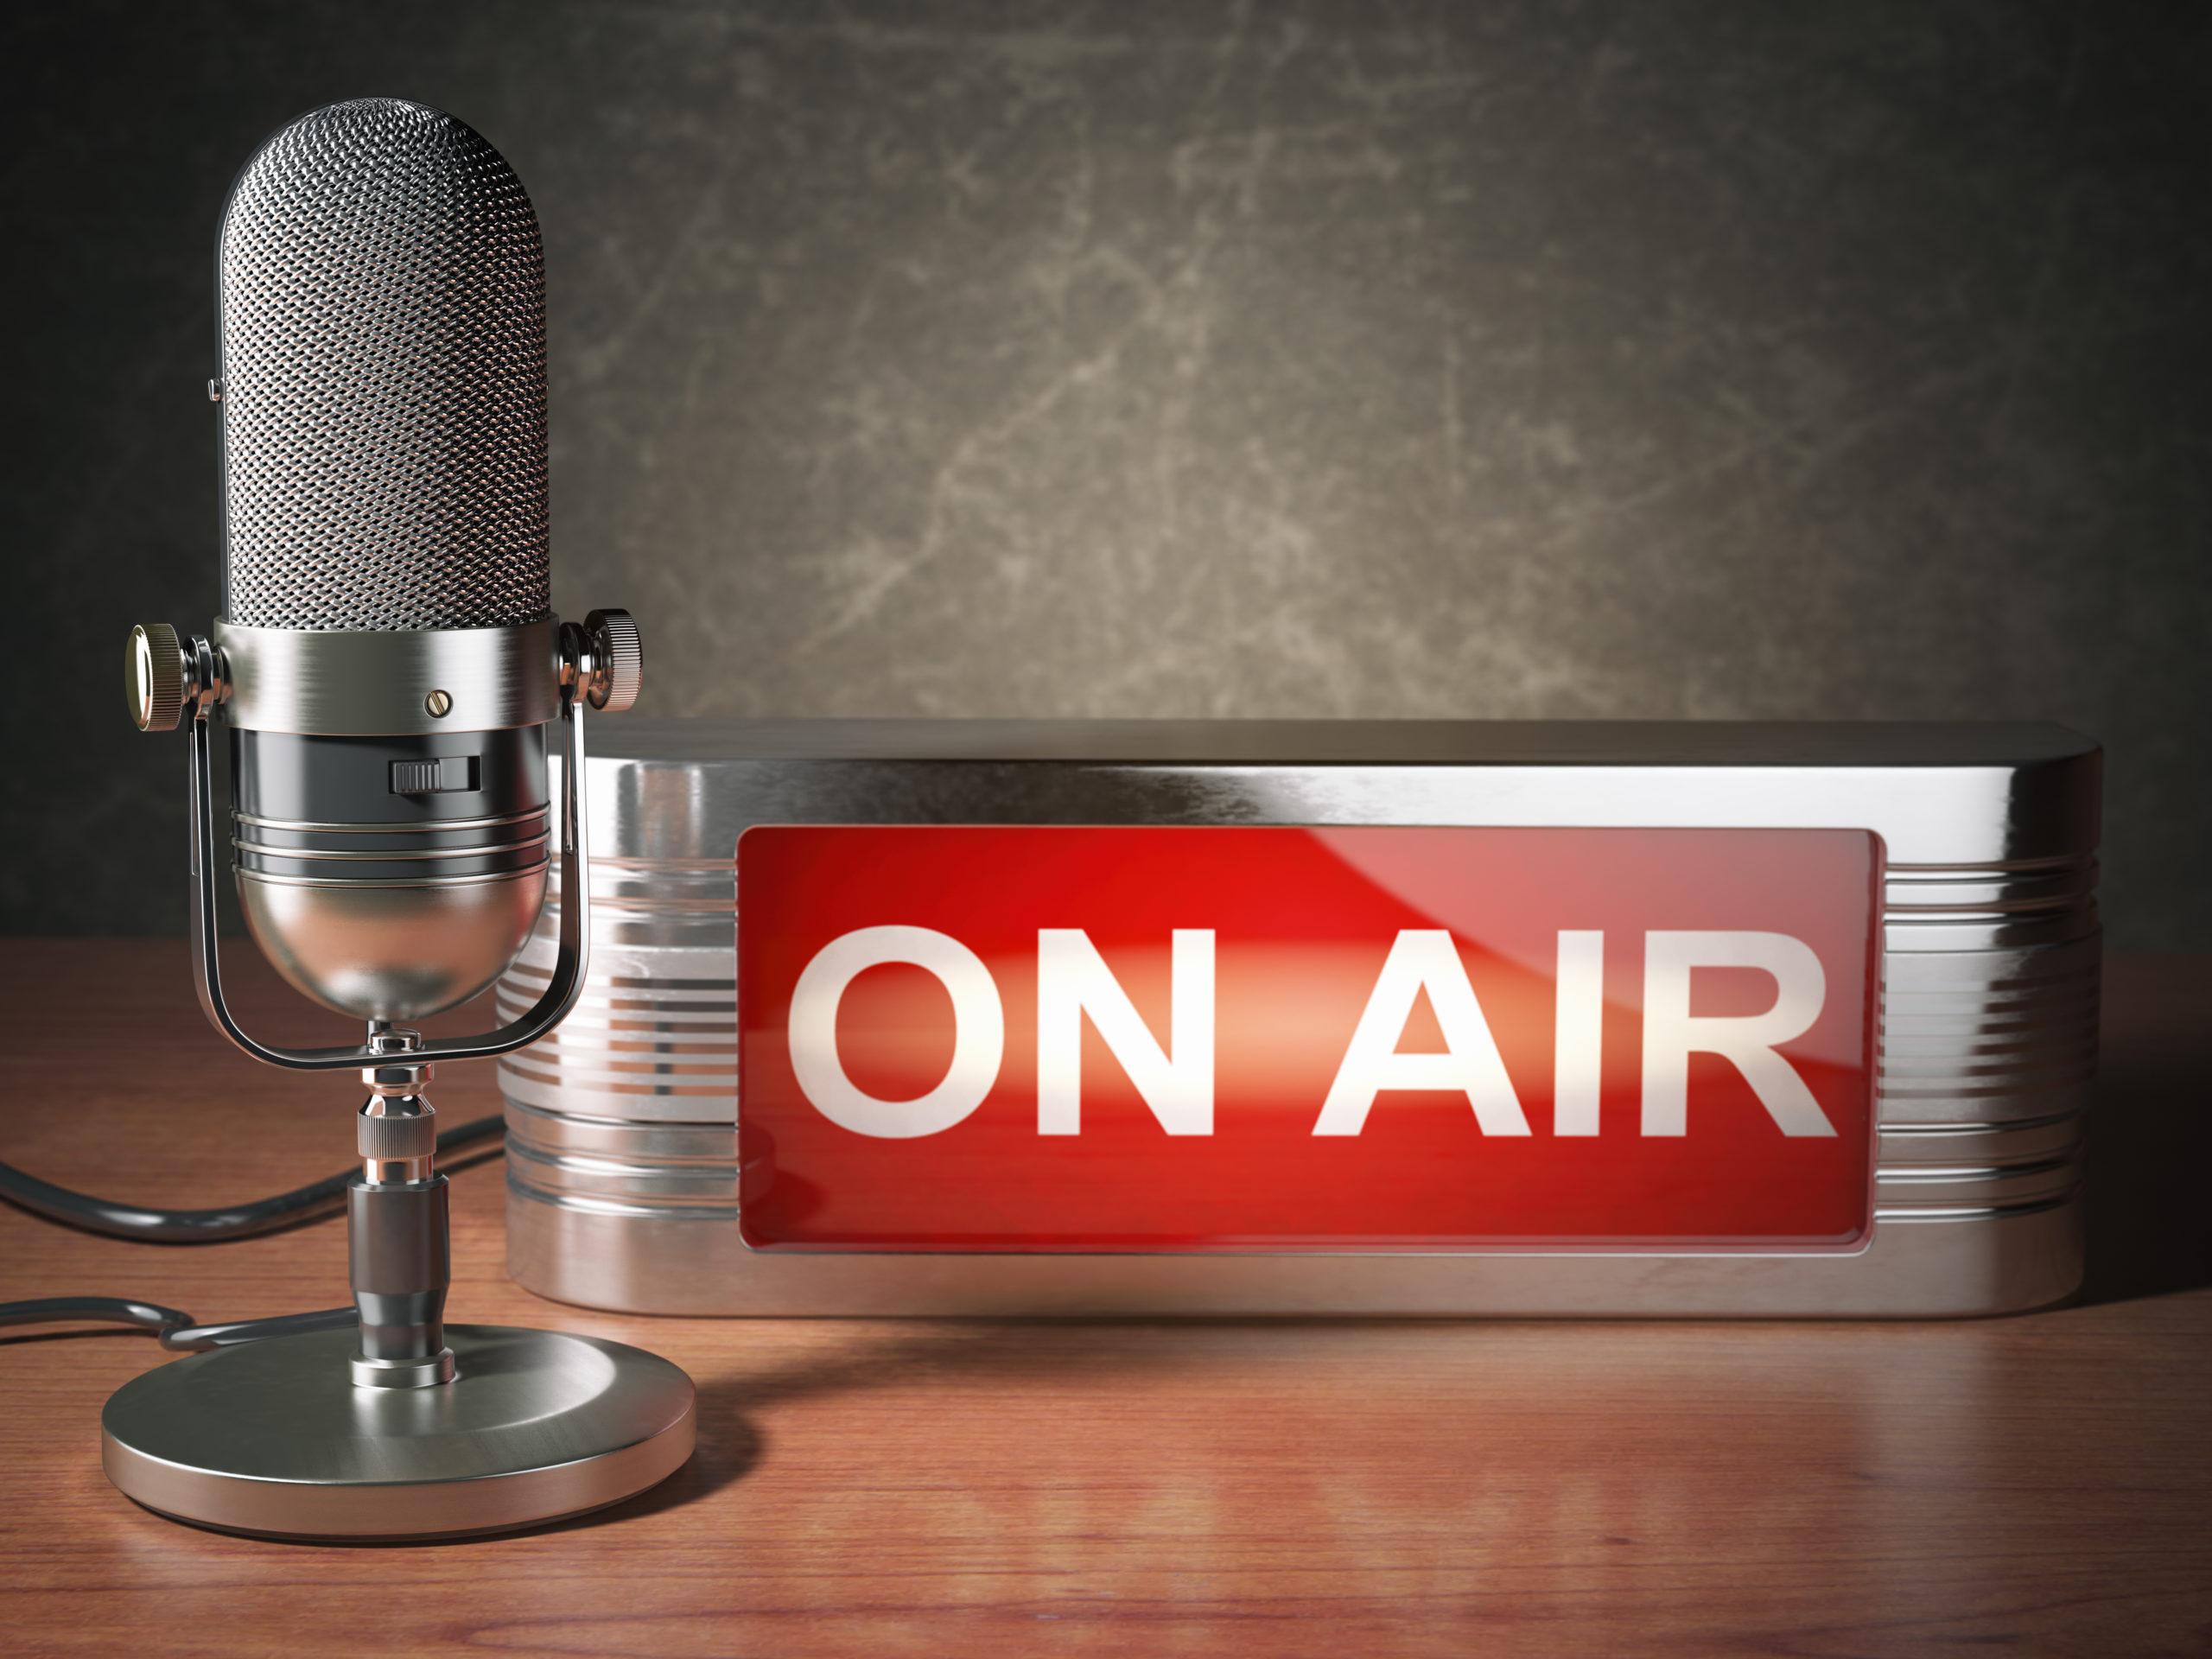 Le contenu multimédia tendance en 2020: le podcast